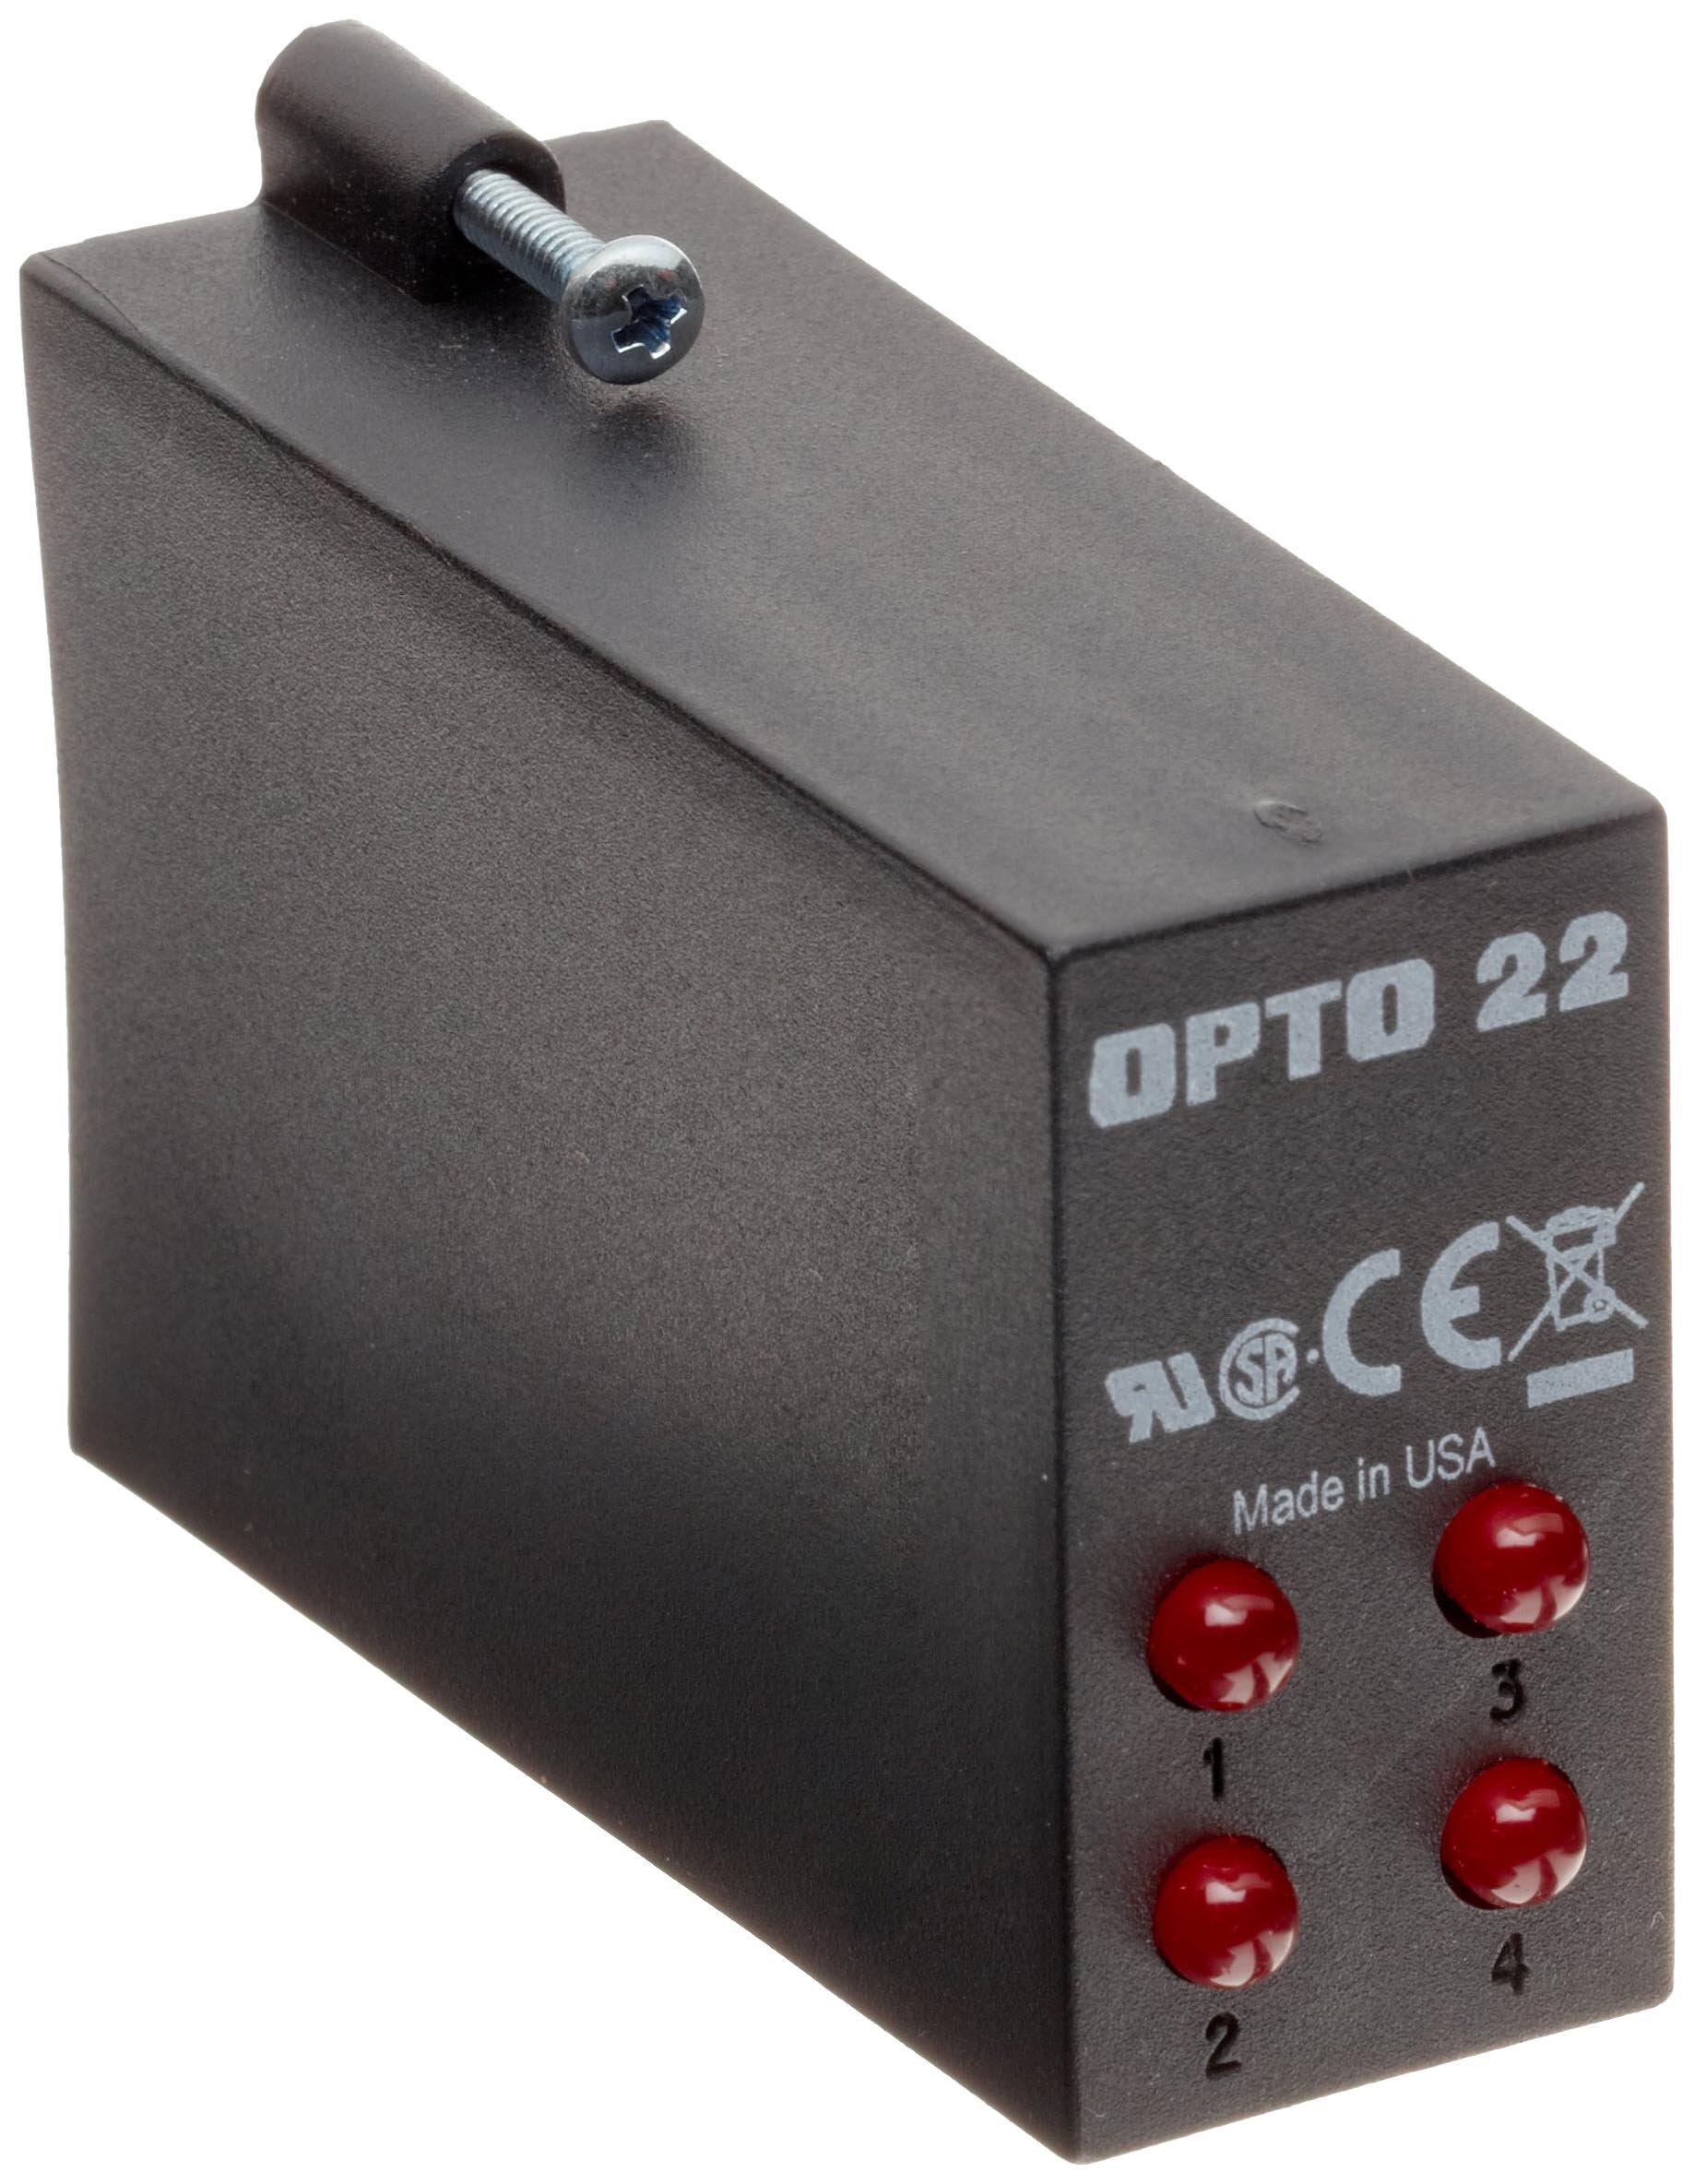 Opto 22 OAC5Q 4-Channel AC Output, 12-280 VAC, 5 VDC Logic, 4000 Vrms I/O Isolation, 20 milliamps Minimum Load Current